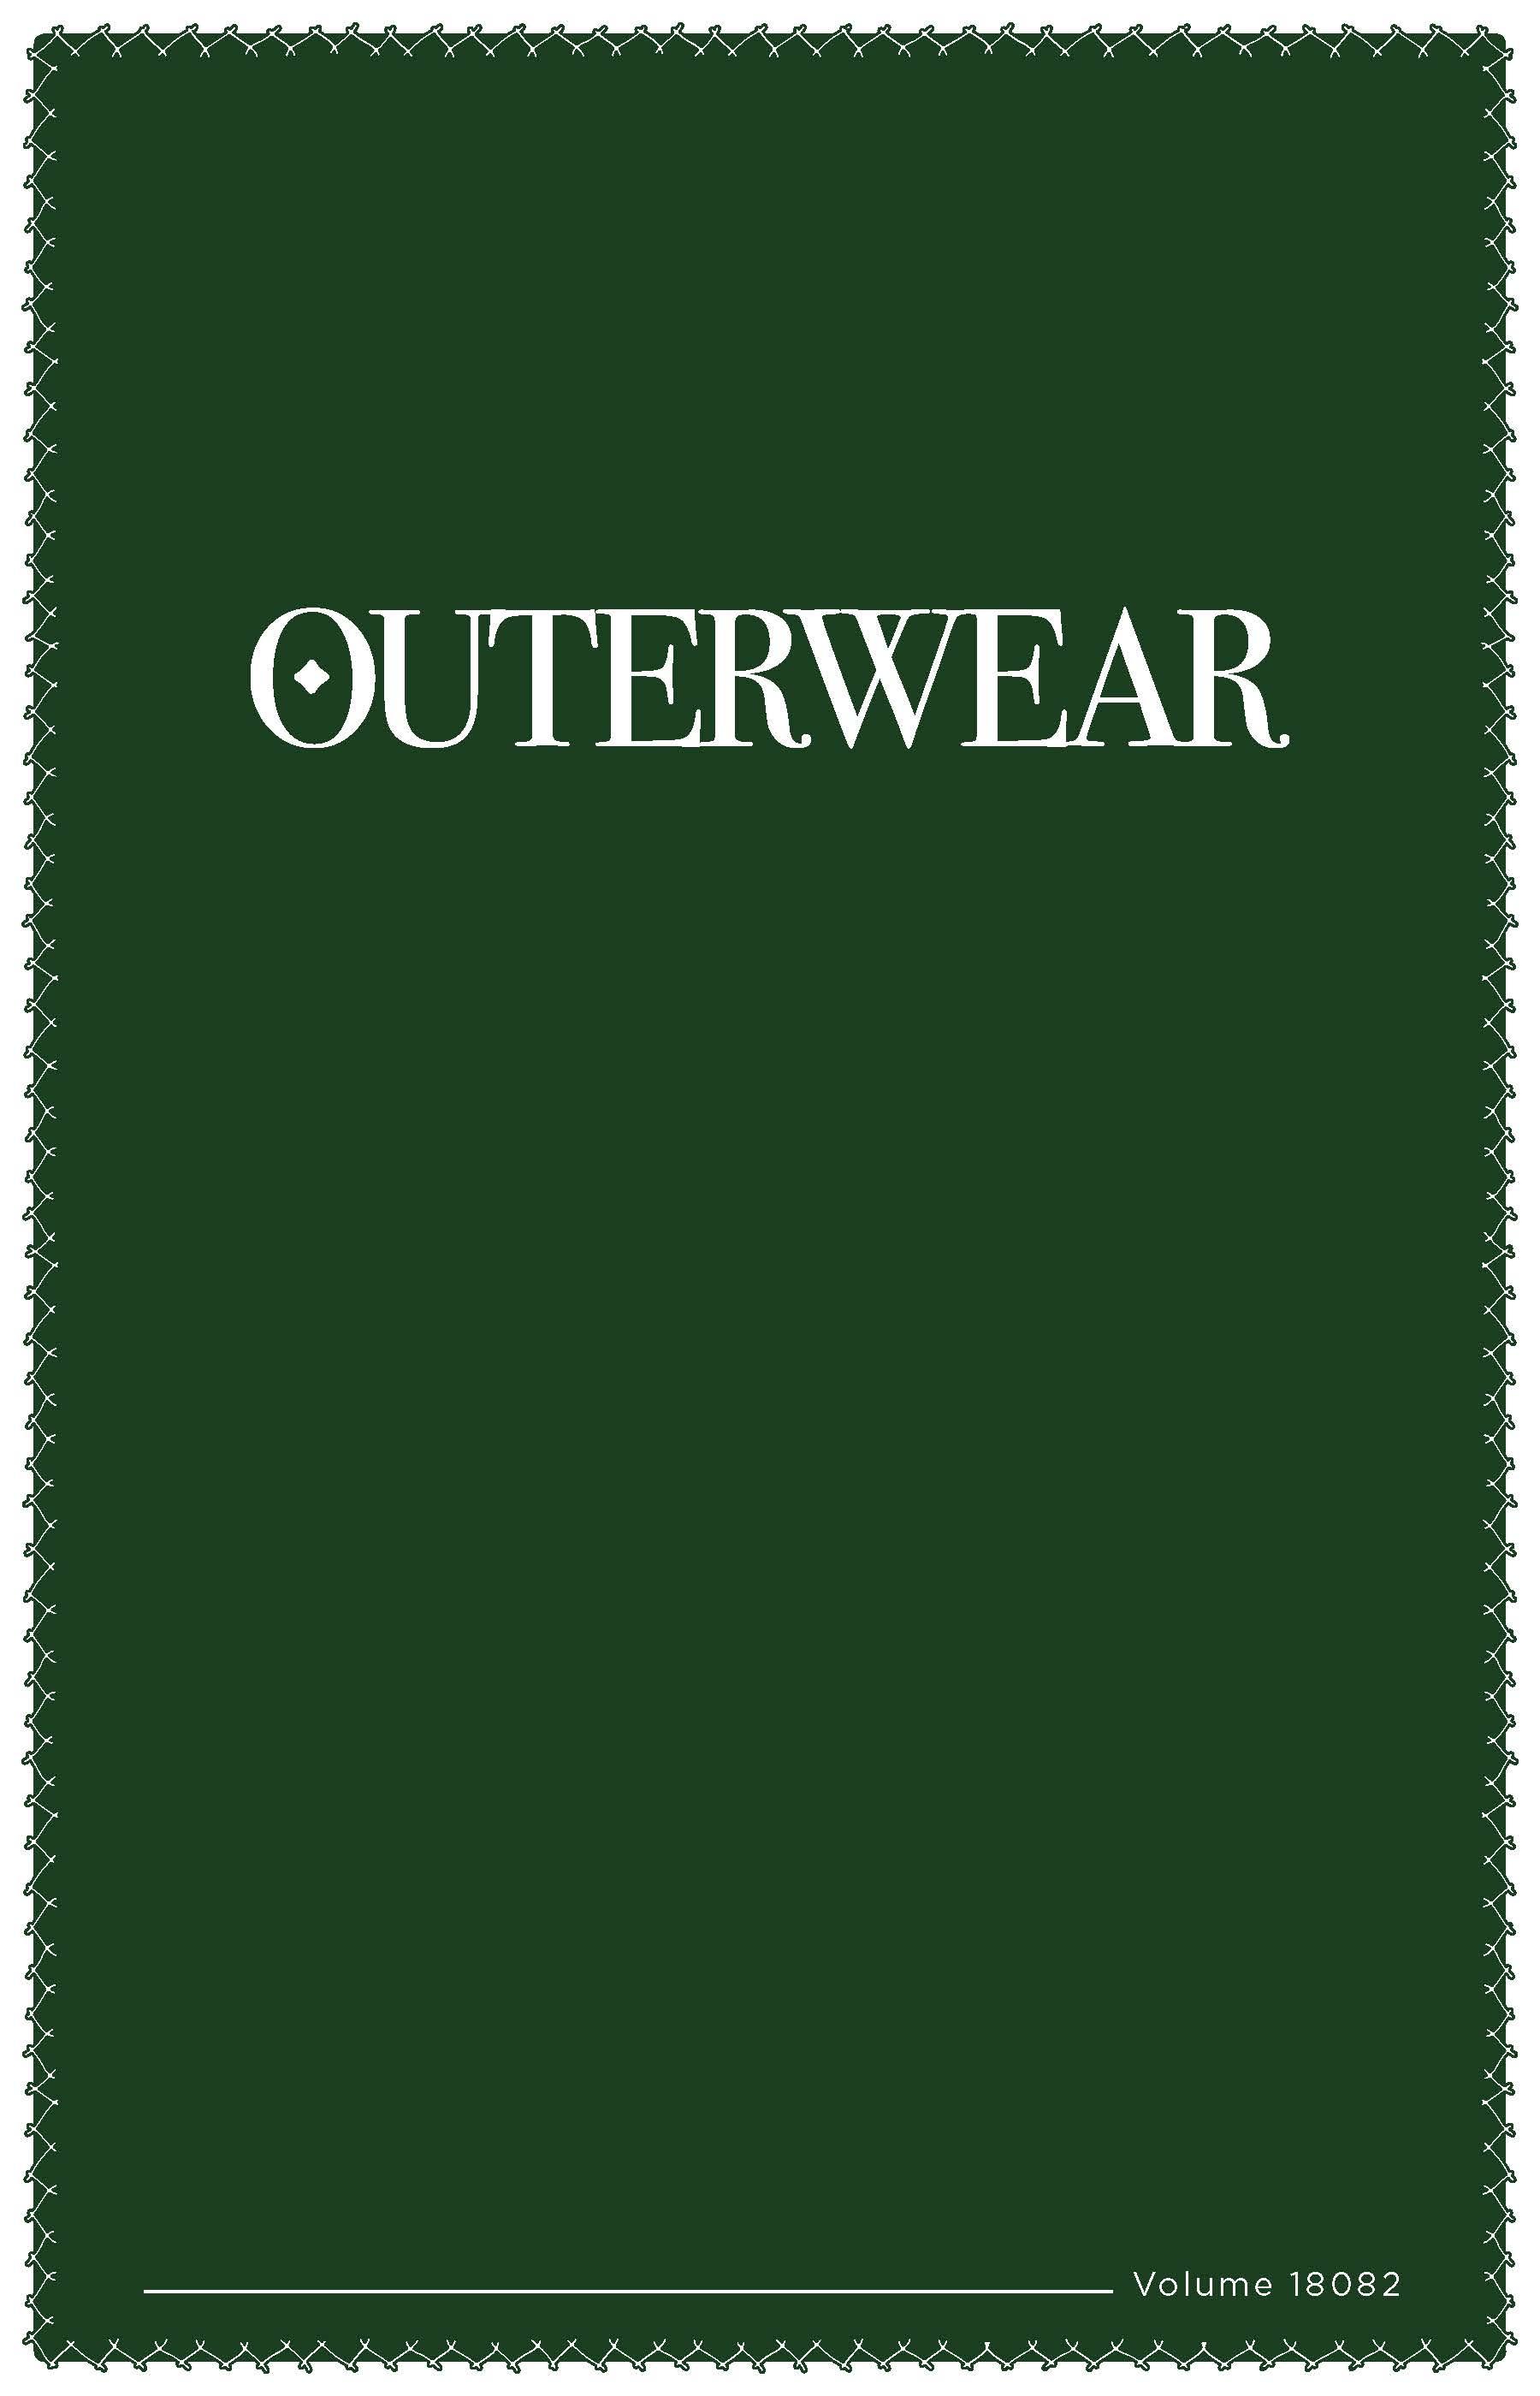 Outerwear_V18082_Digital.jpg